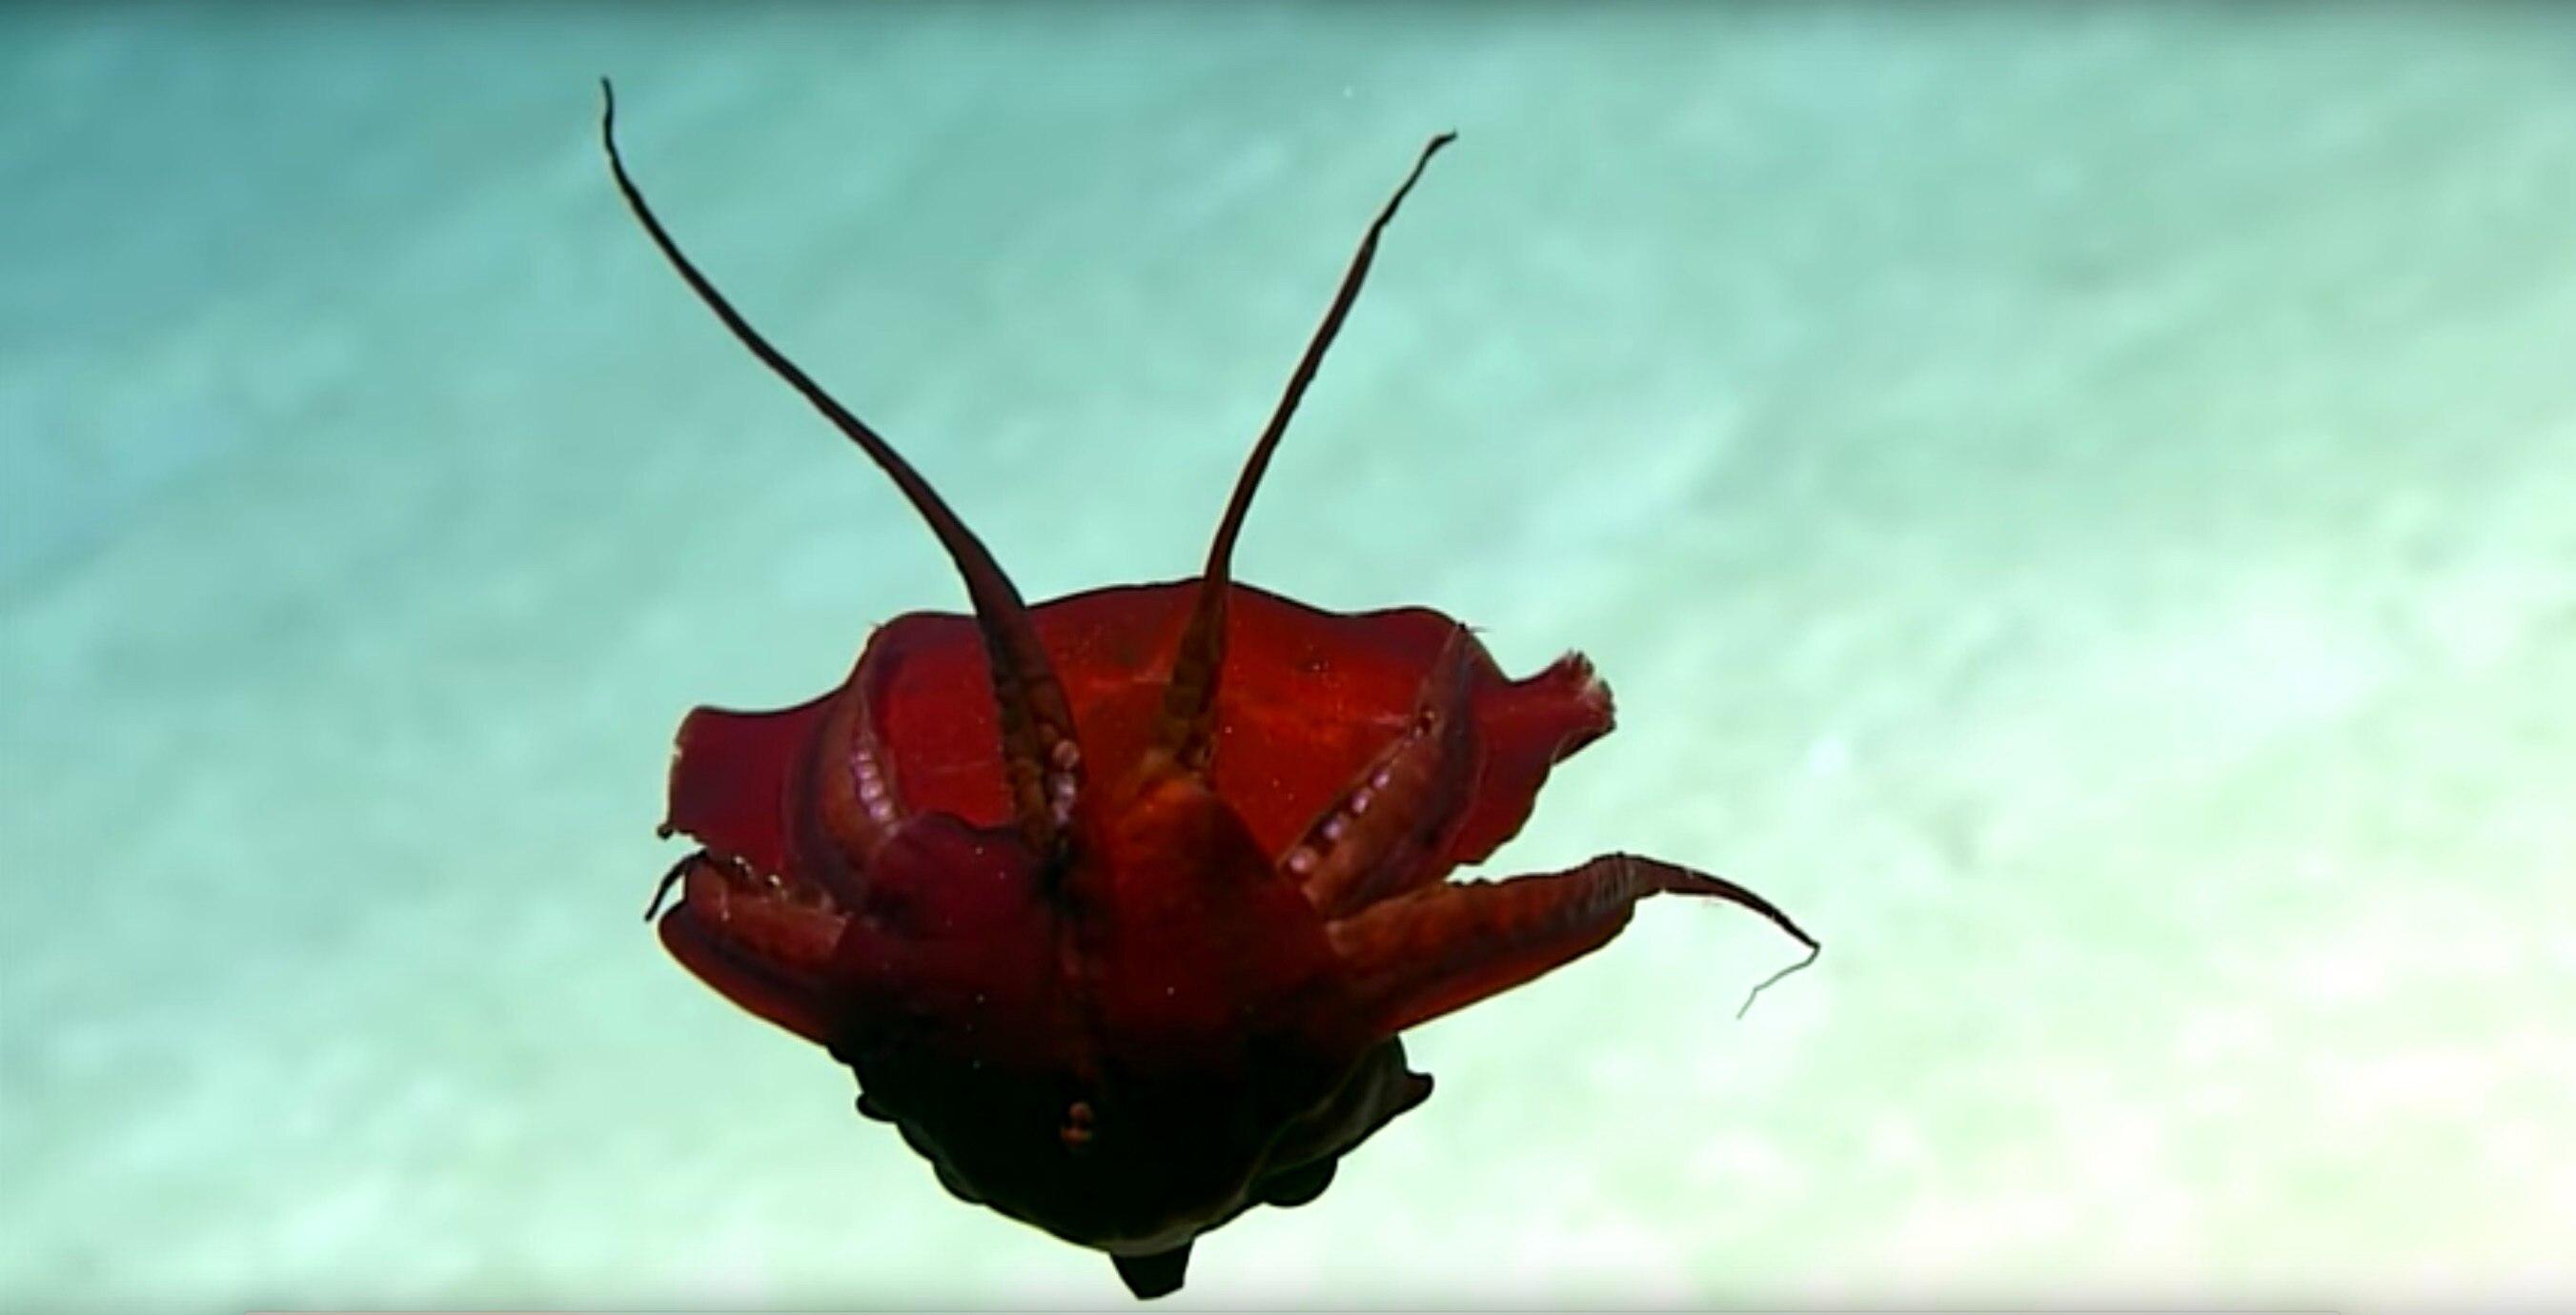 Forscher entdecken seltsame Kreatur im Golf von Mexiko